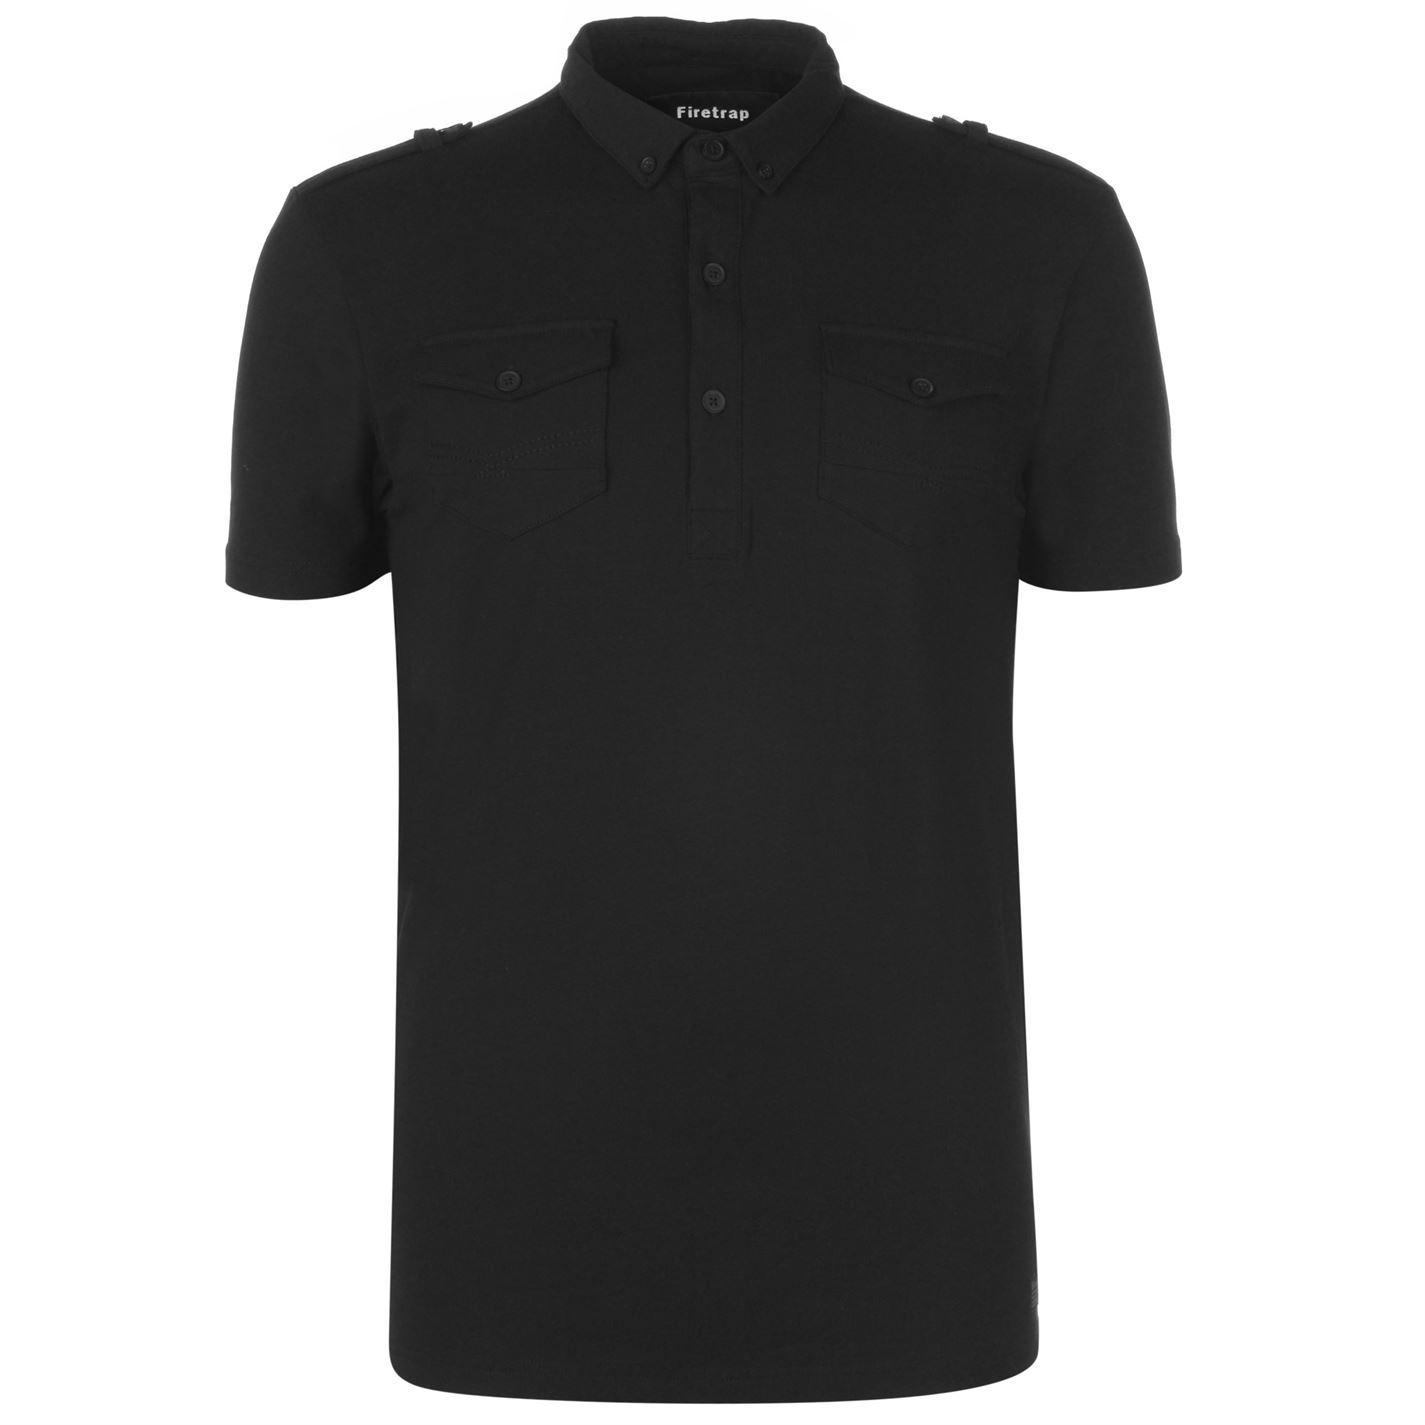 thumbnail 6 - Firetrap-Double-Pocket-Polo-Shirt-Mens-Collar-Top-Tee-Black-Medium